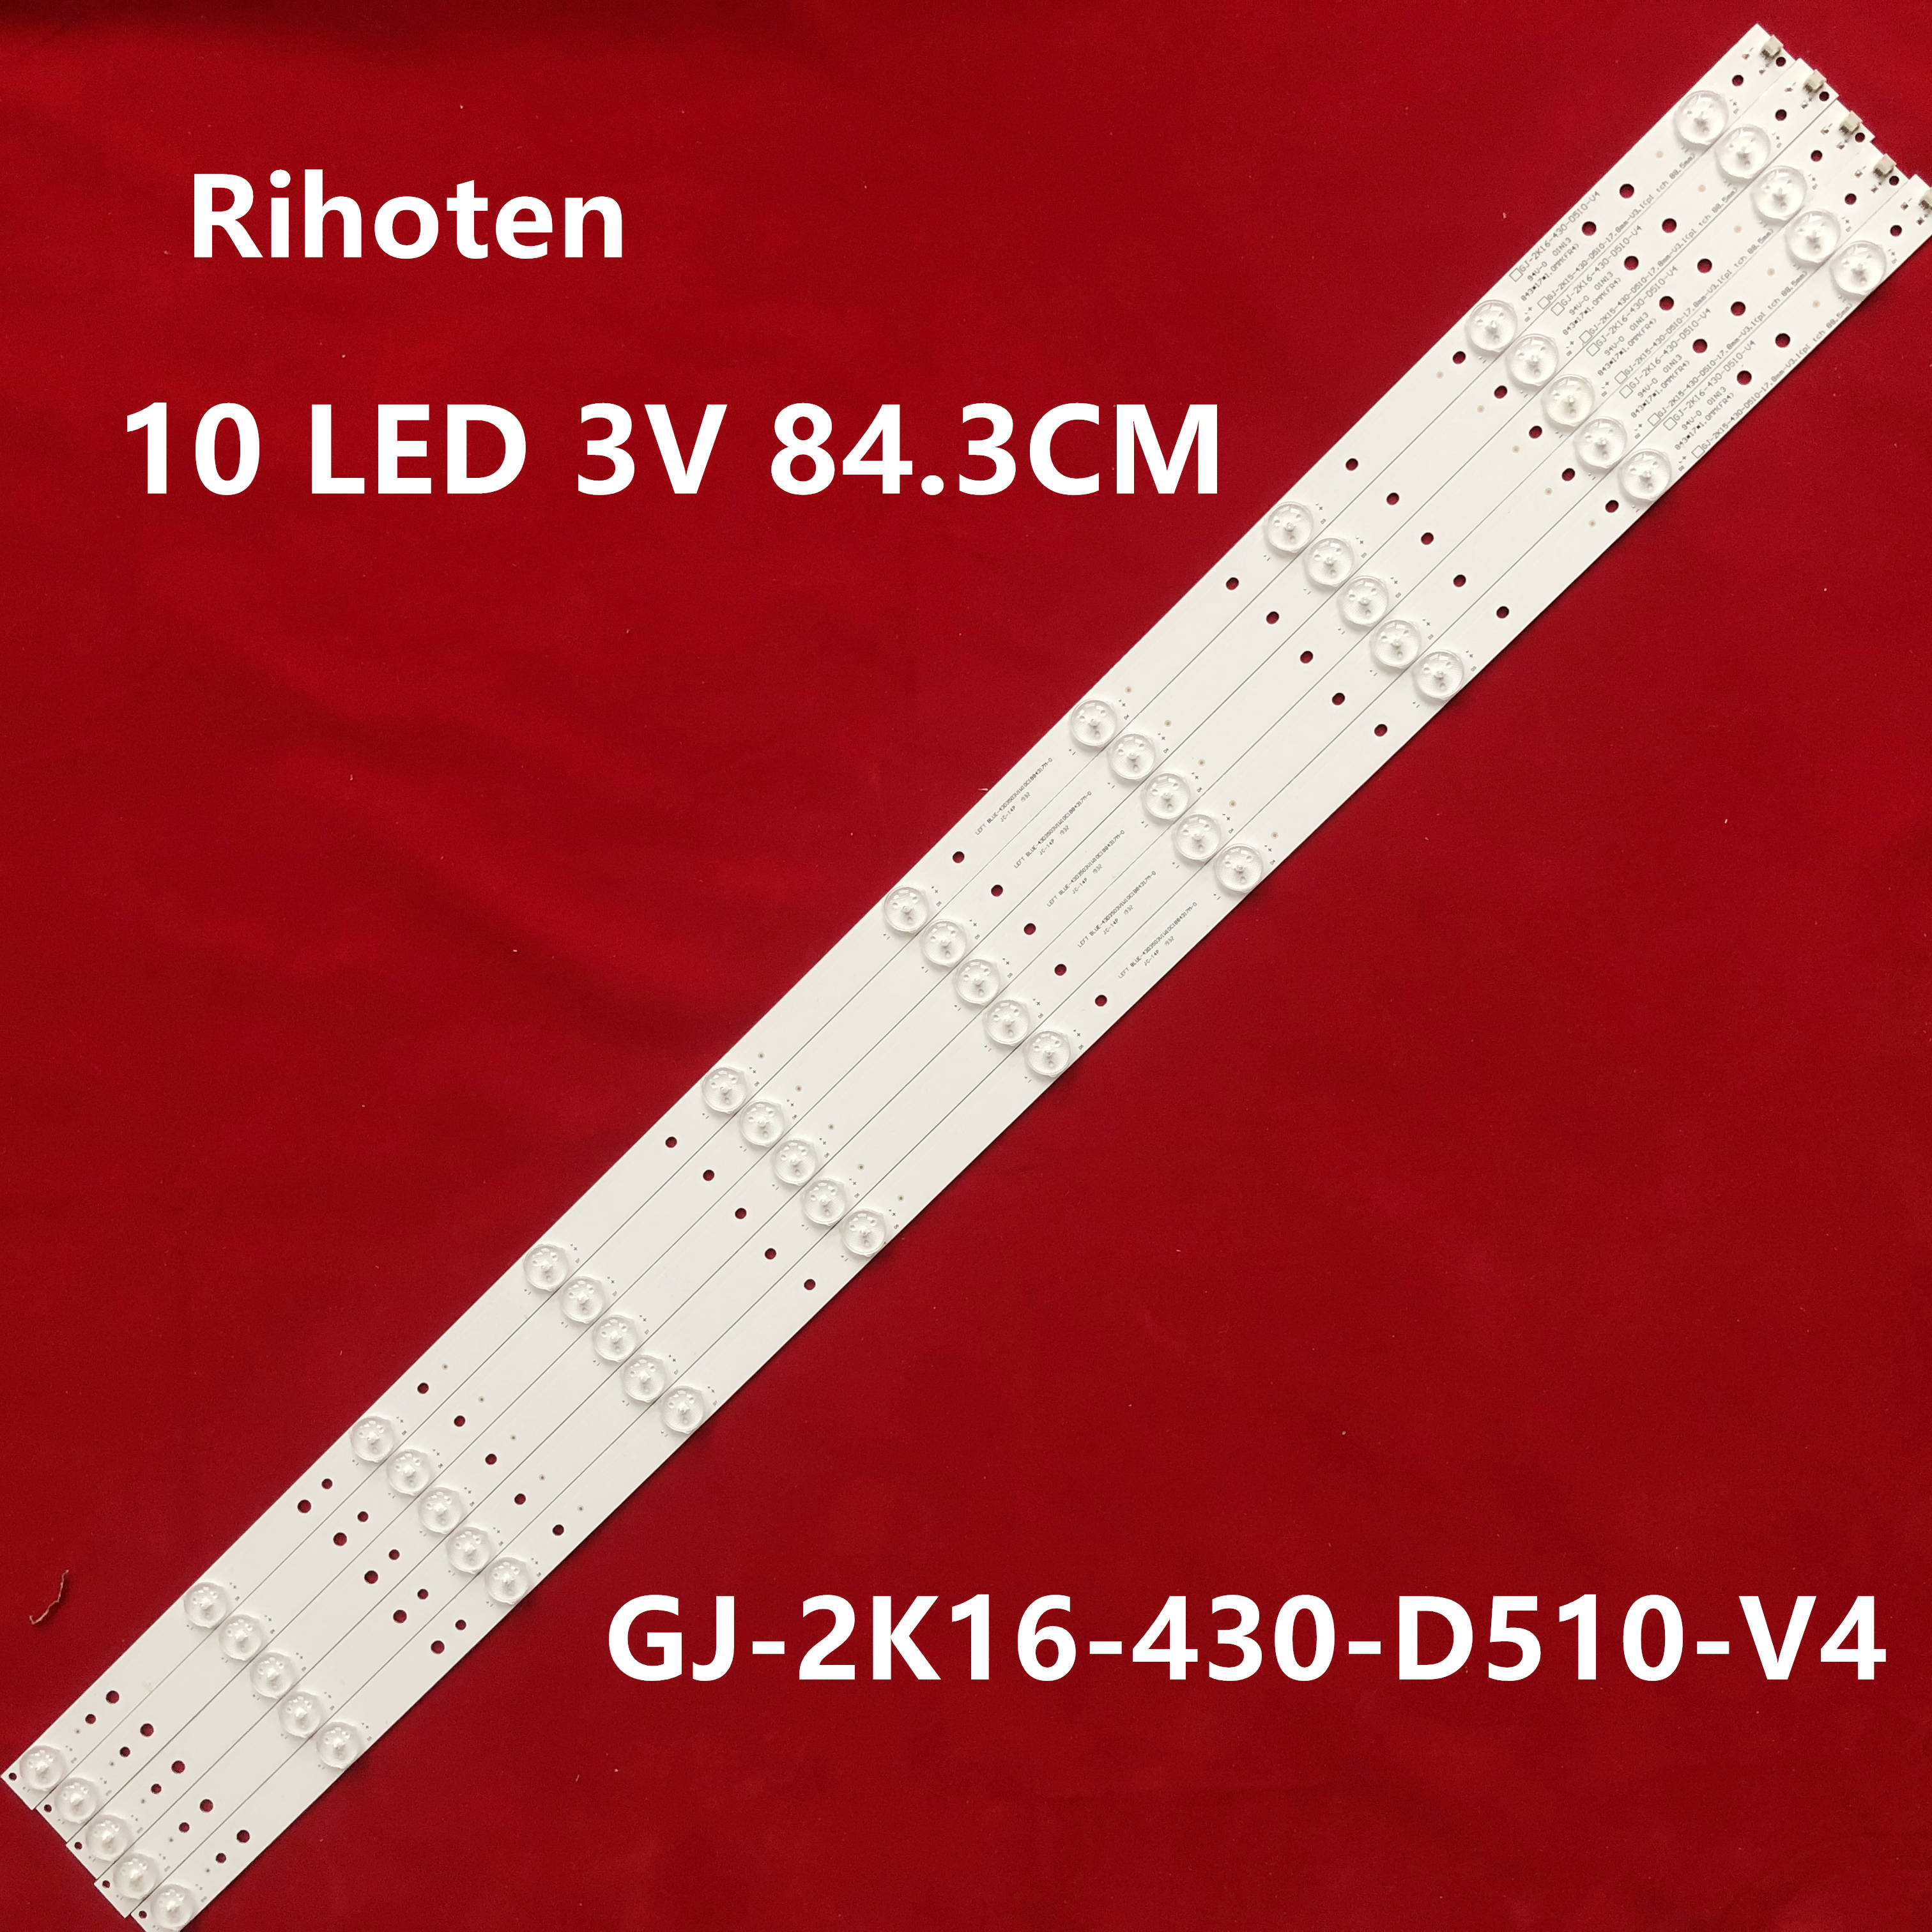 "Lámpara de 10 tira de LED para iluminación trasera para televisor Philips de 43 "", 43PFT4131, 43PFS5301, GJ-2K15-430-D510, GJ-2K16-430-D510-V4, 01Q58-A, BDM4350"